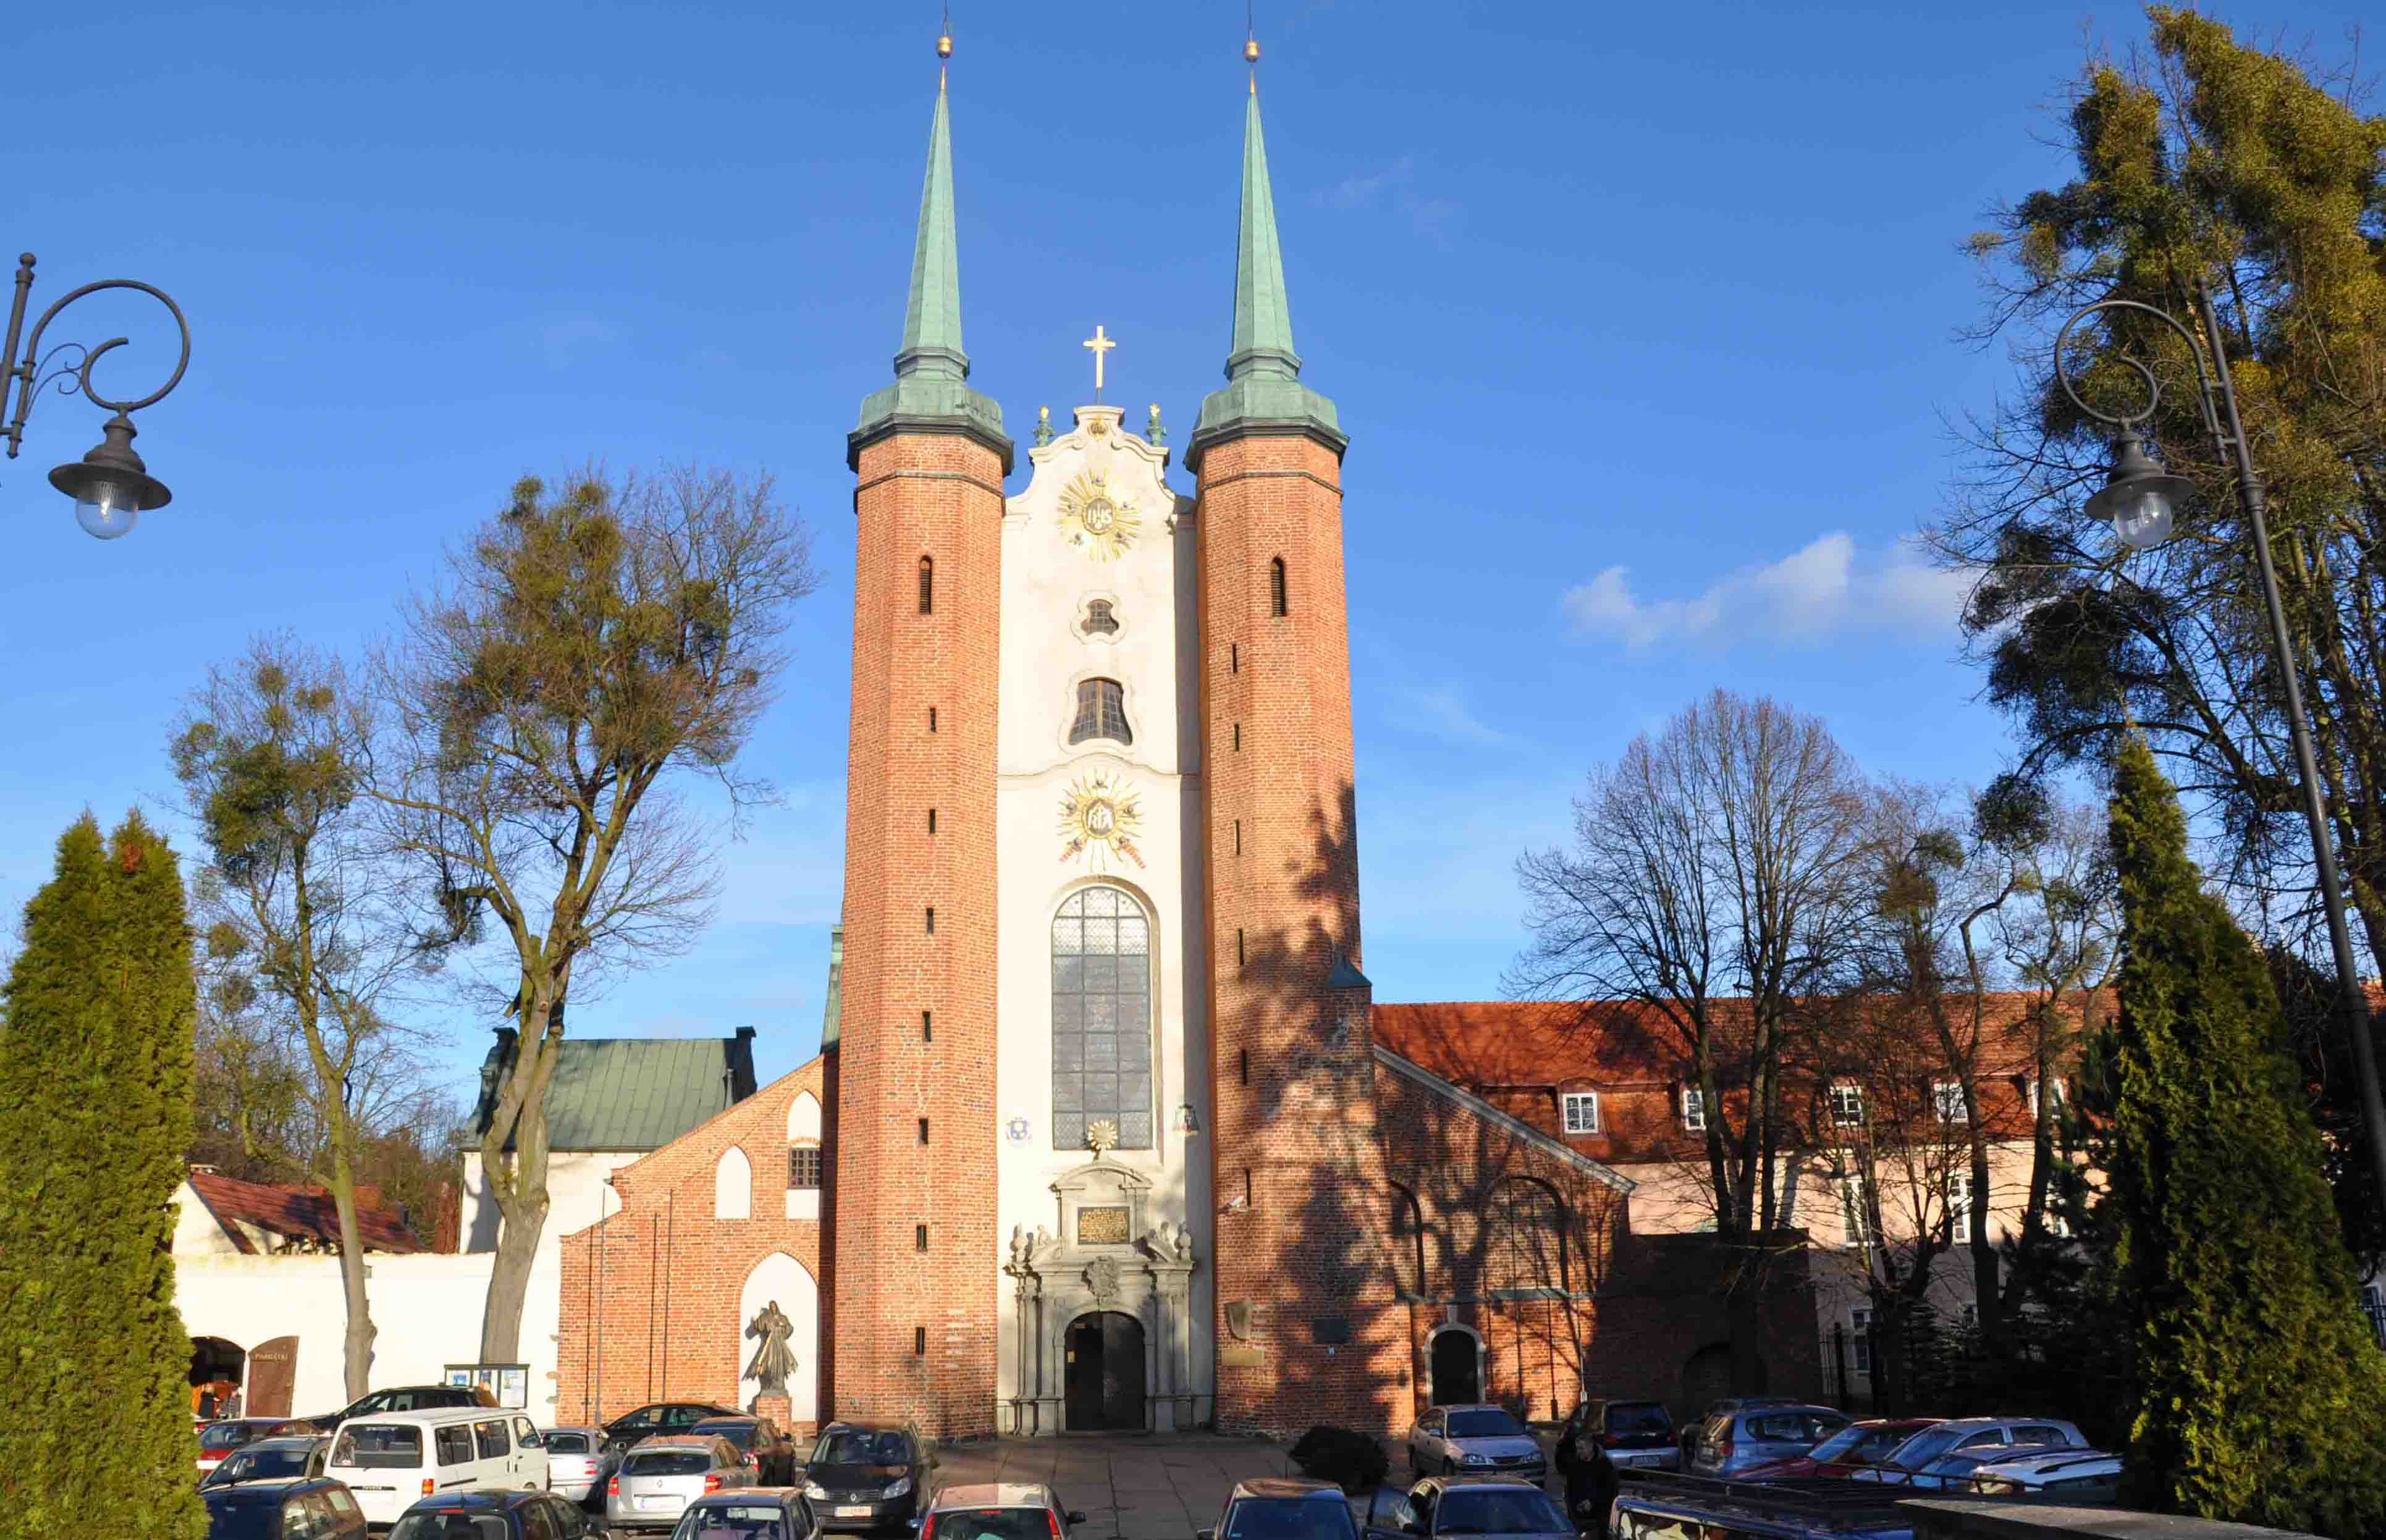 Oliwa Cathedral, Gdansk